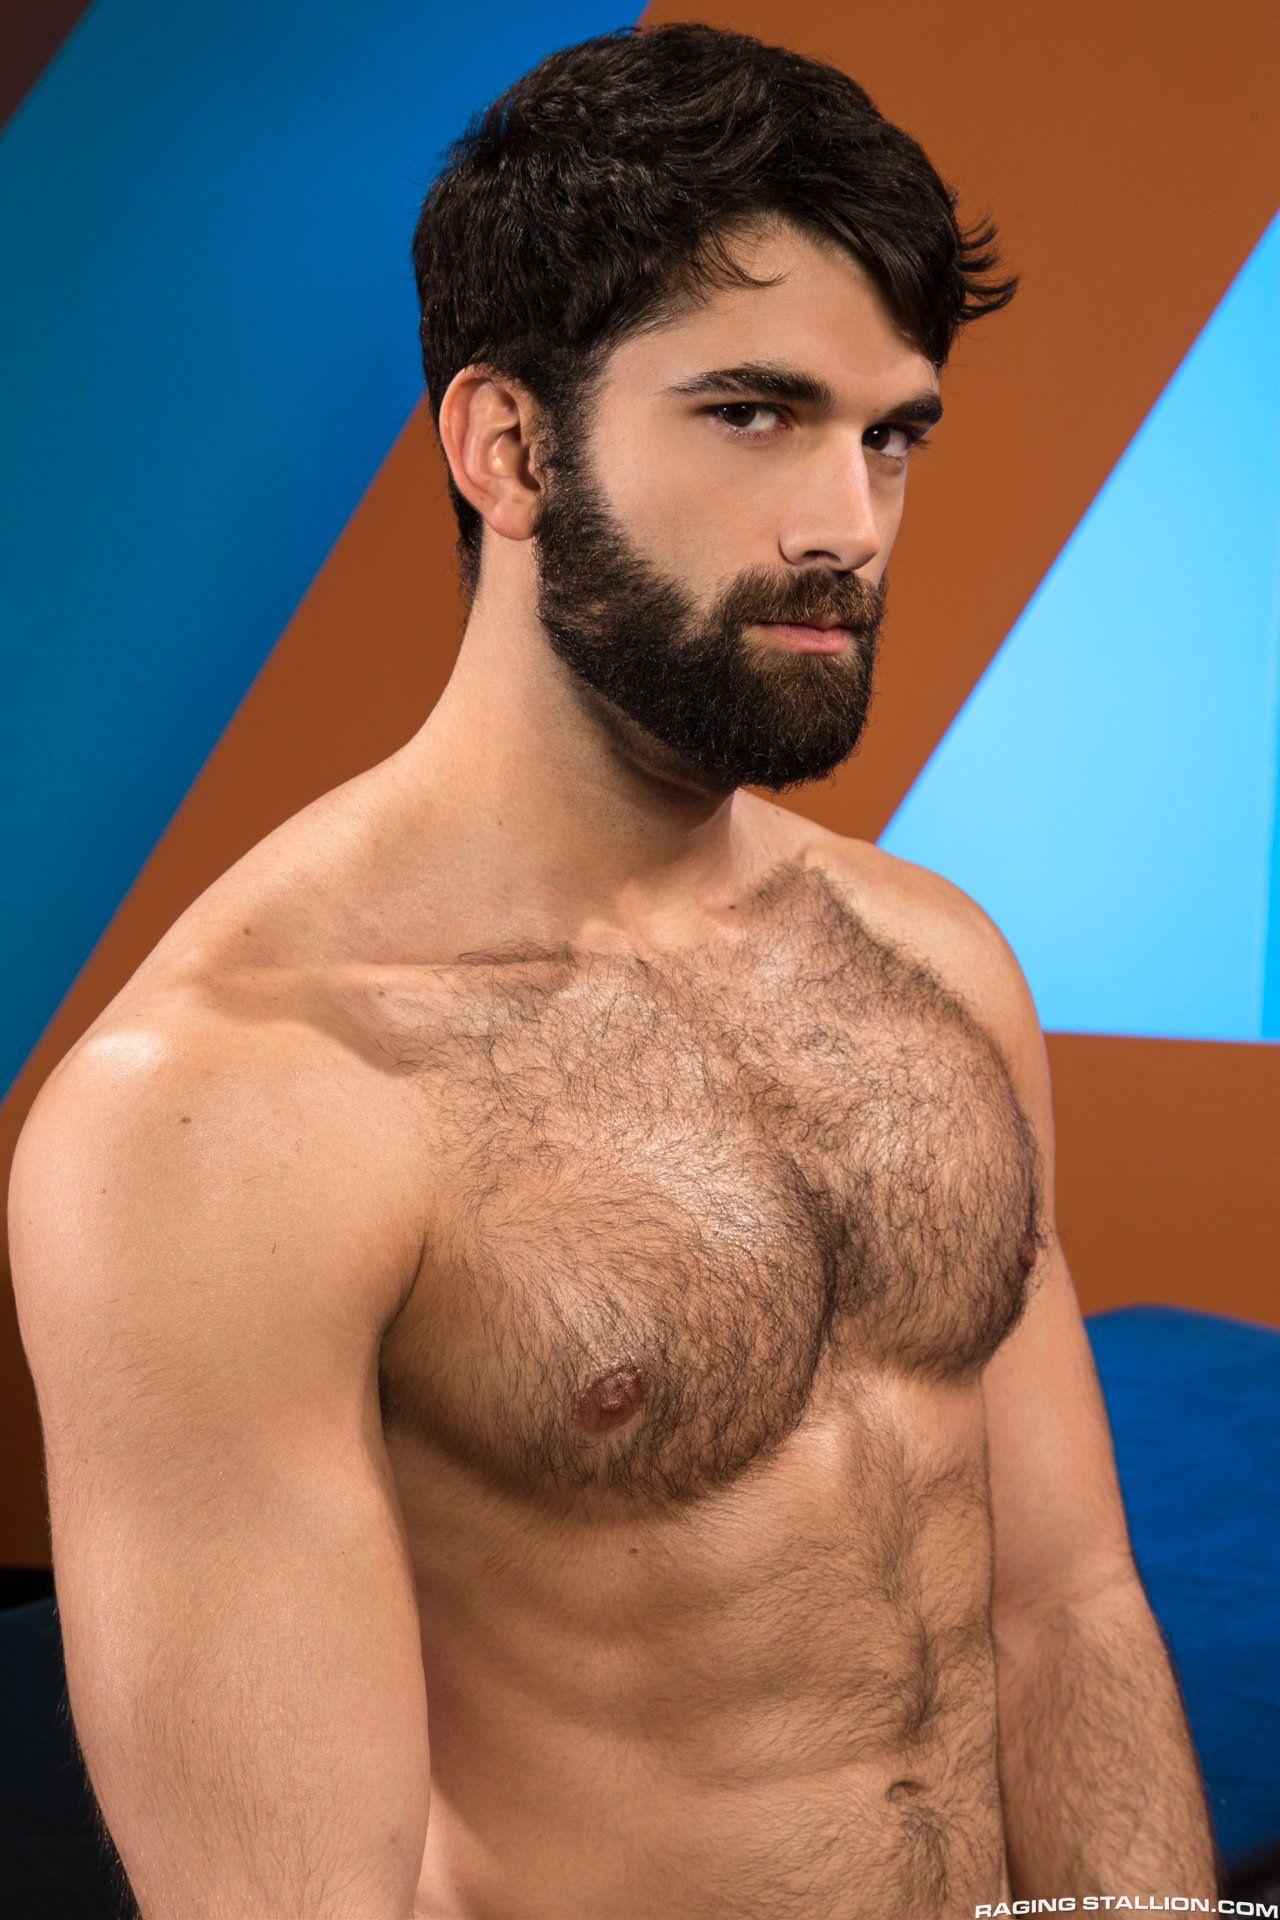 Chest hairy man beard with